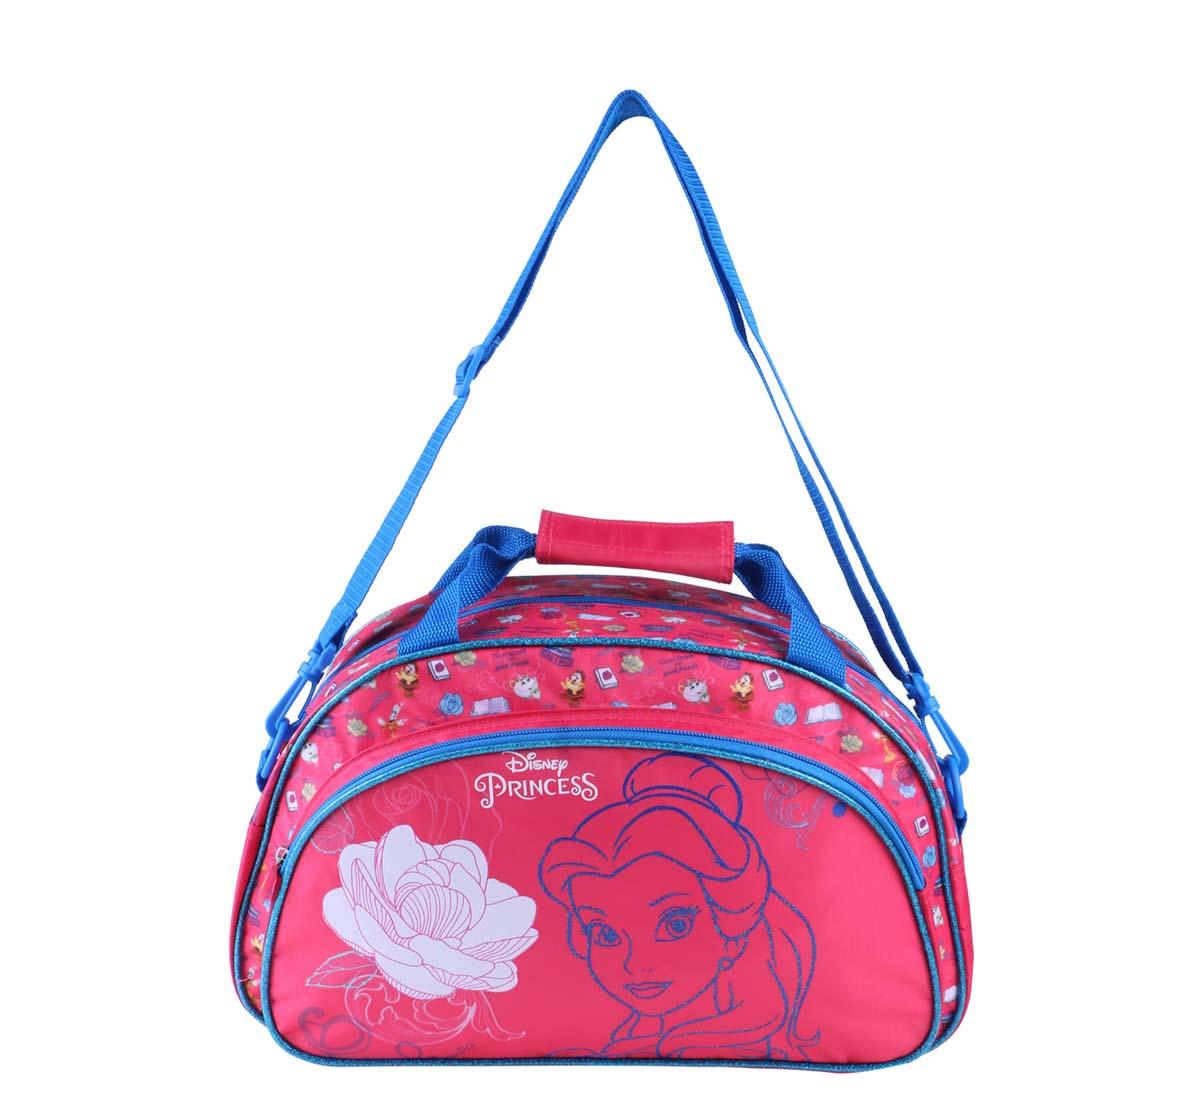 Disney | Disney Princess - Light Pink Fashion Carry Bags for Girls age 3Y+